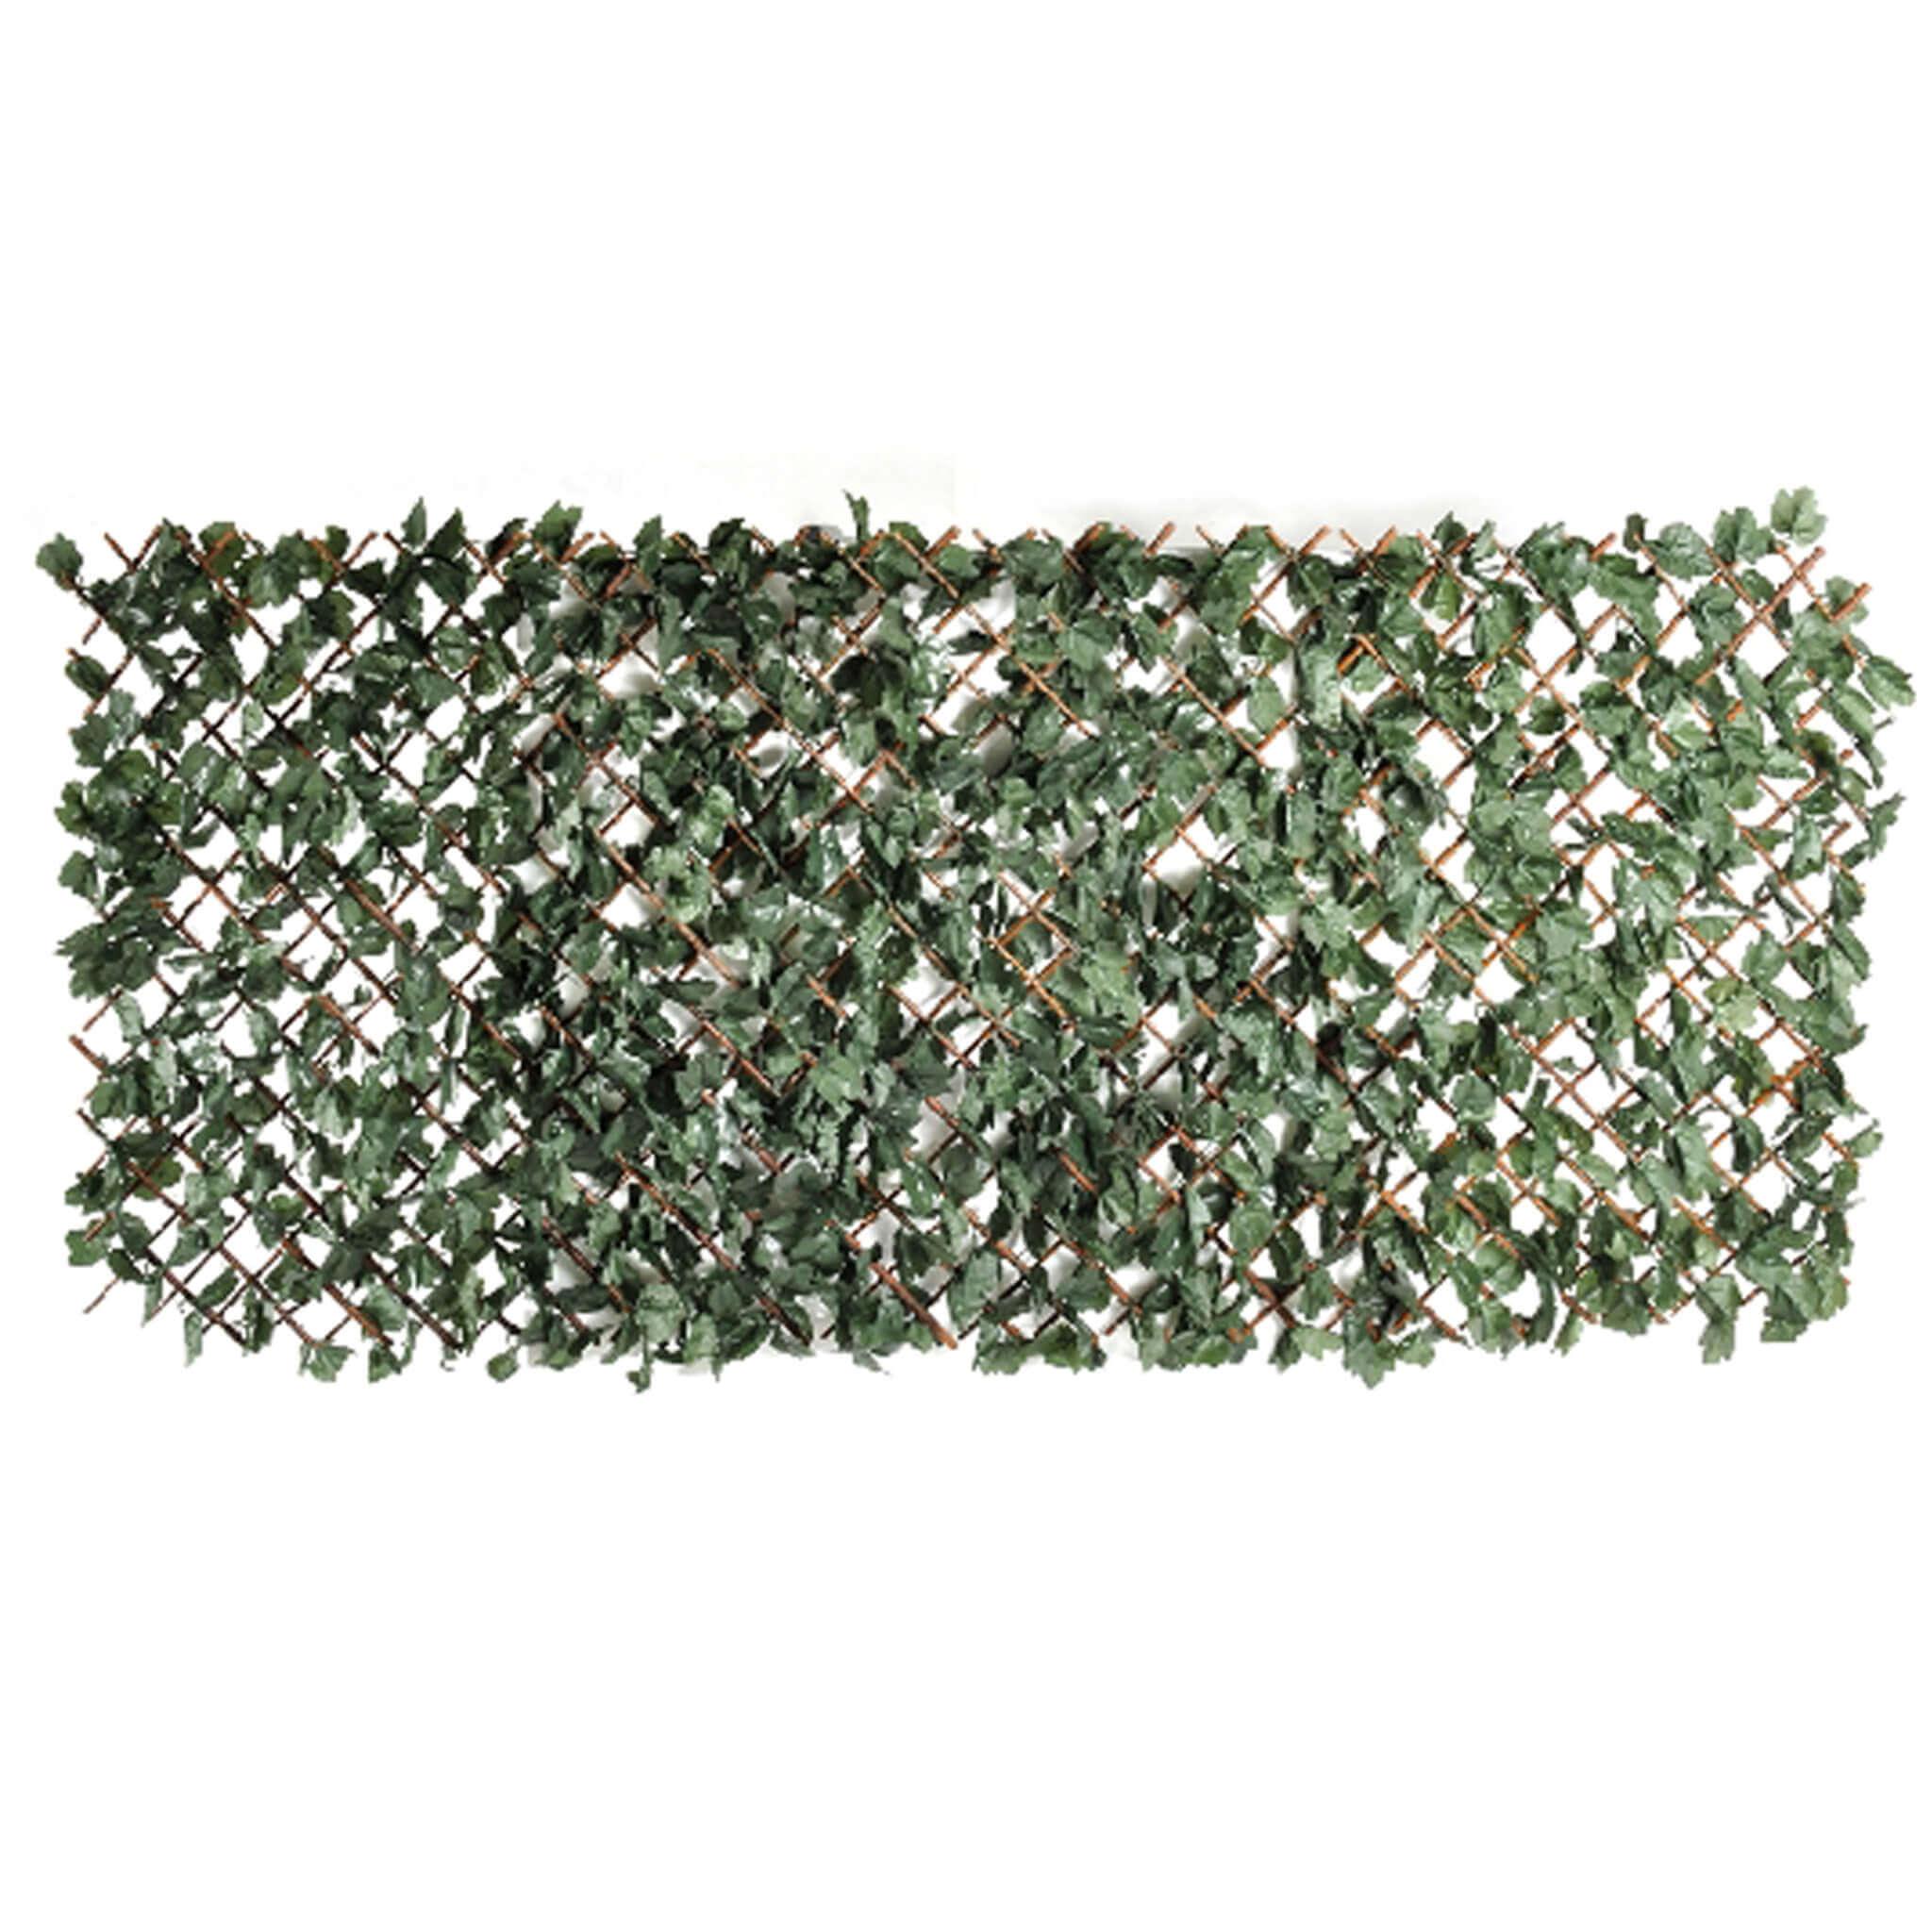 Milani Home Siepe artificiale 100 x 200